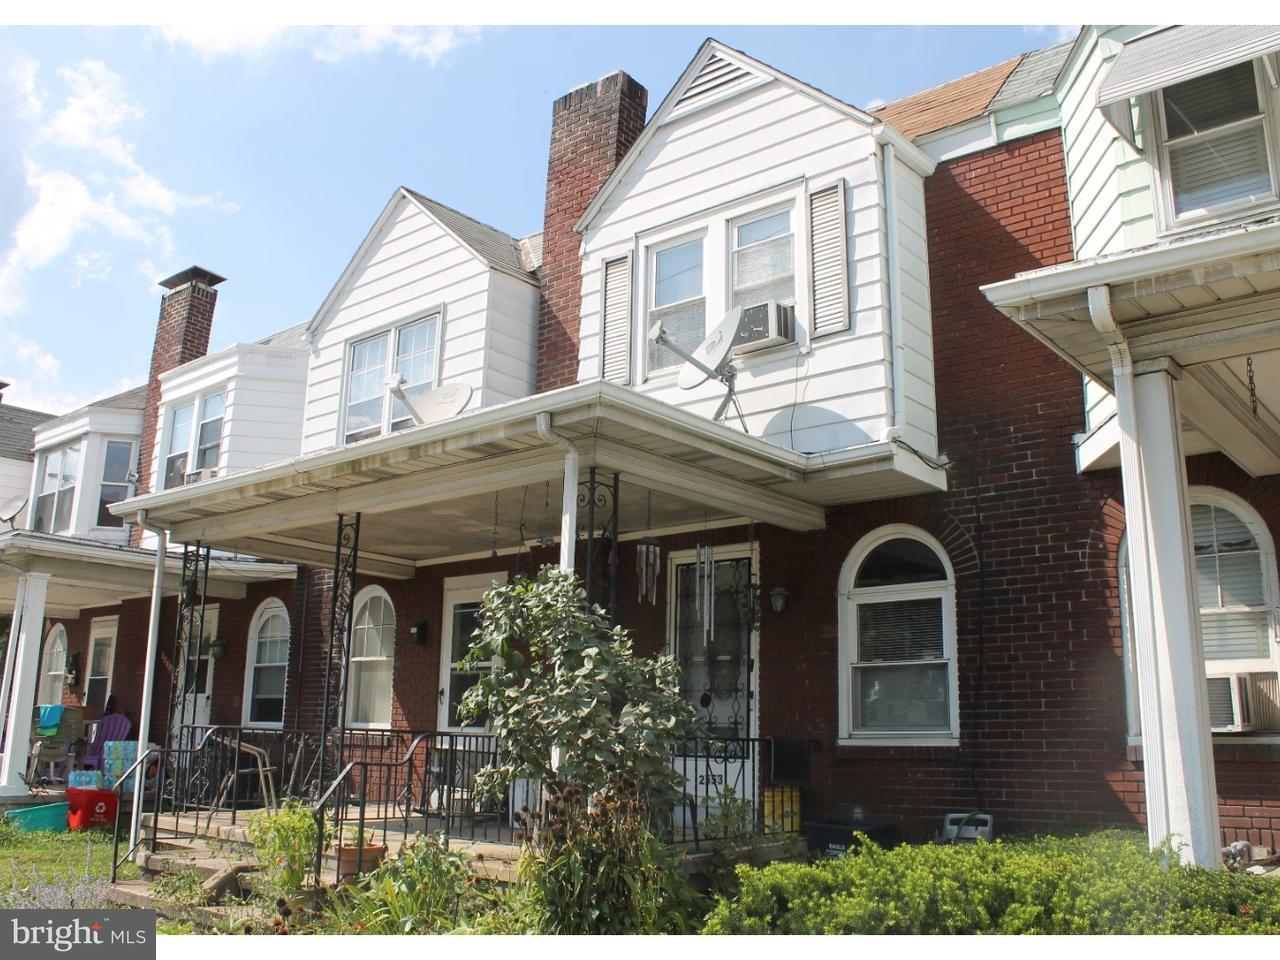 Townhouse for Sale at 2553 PERKIOMEN Avenue Mount Penn, Pennsylvania 19606 United States